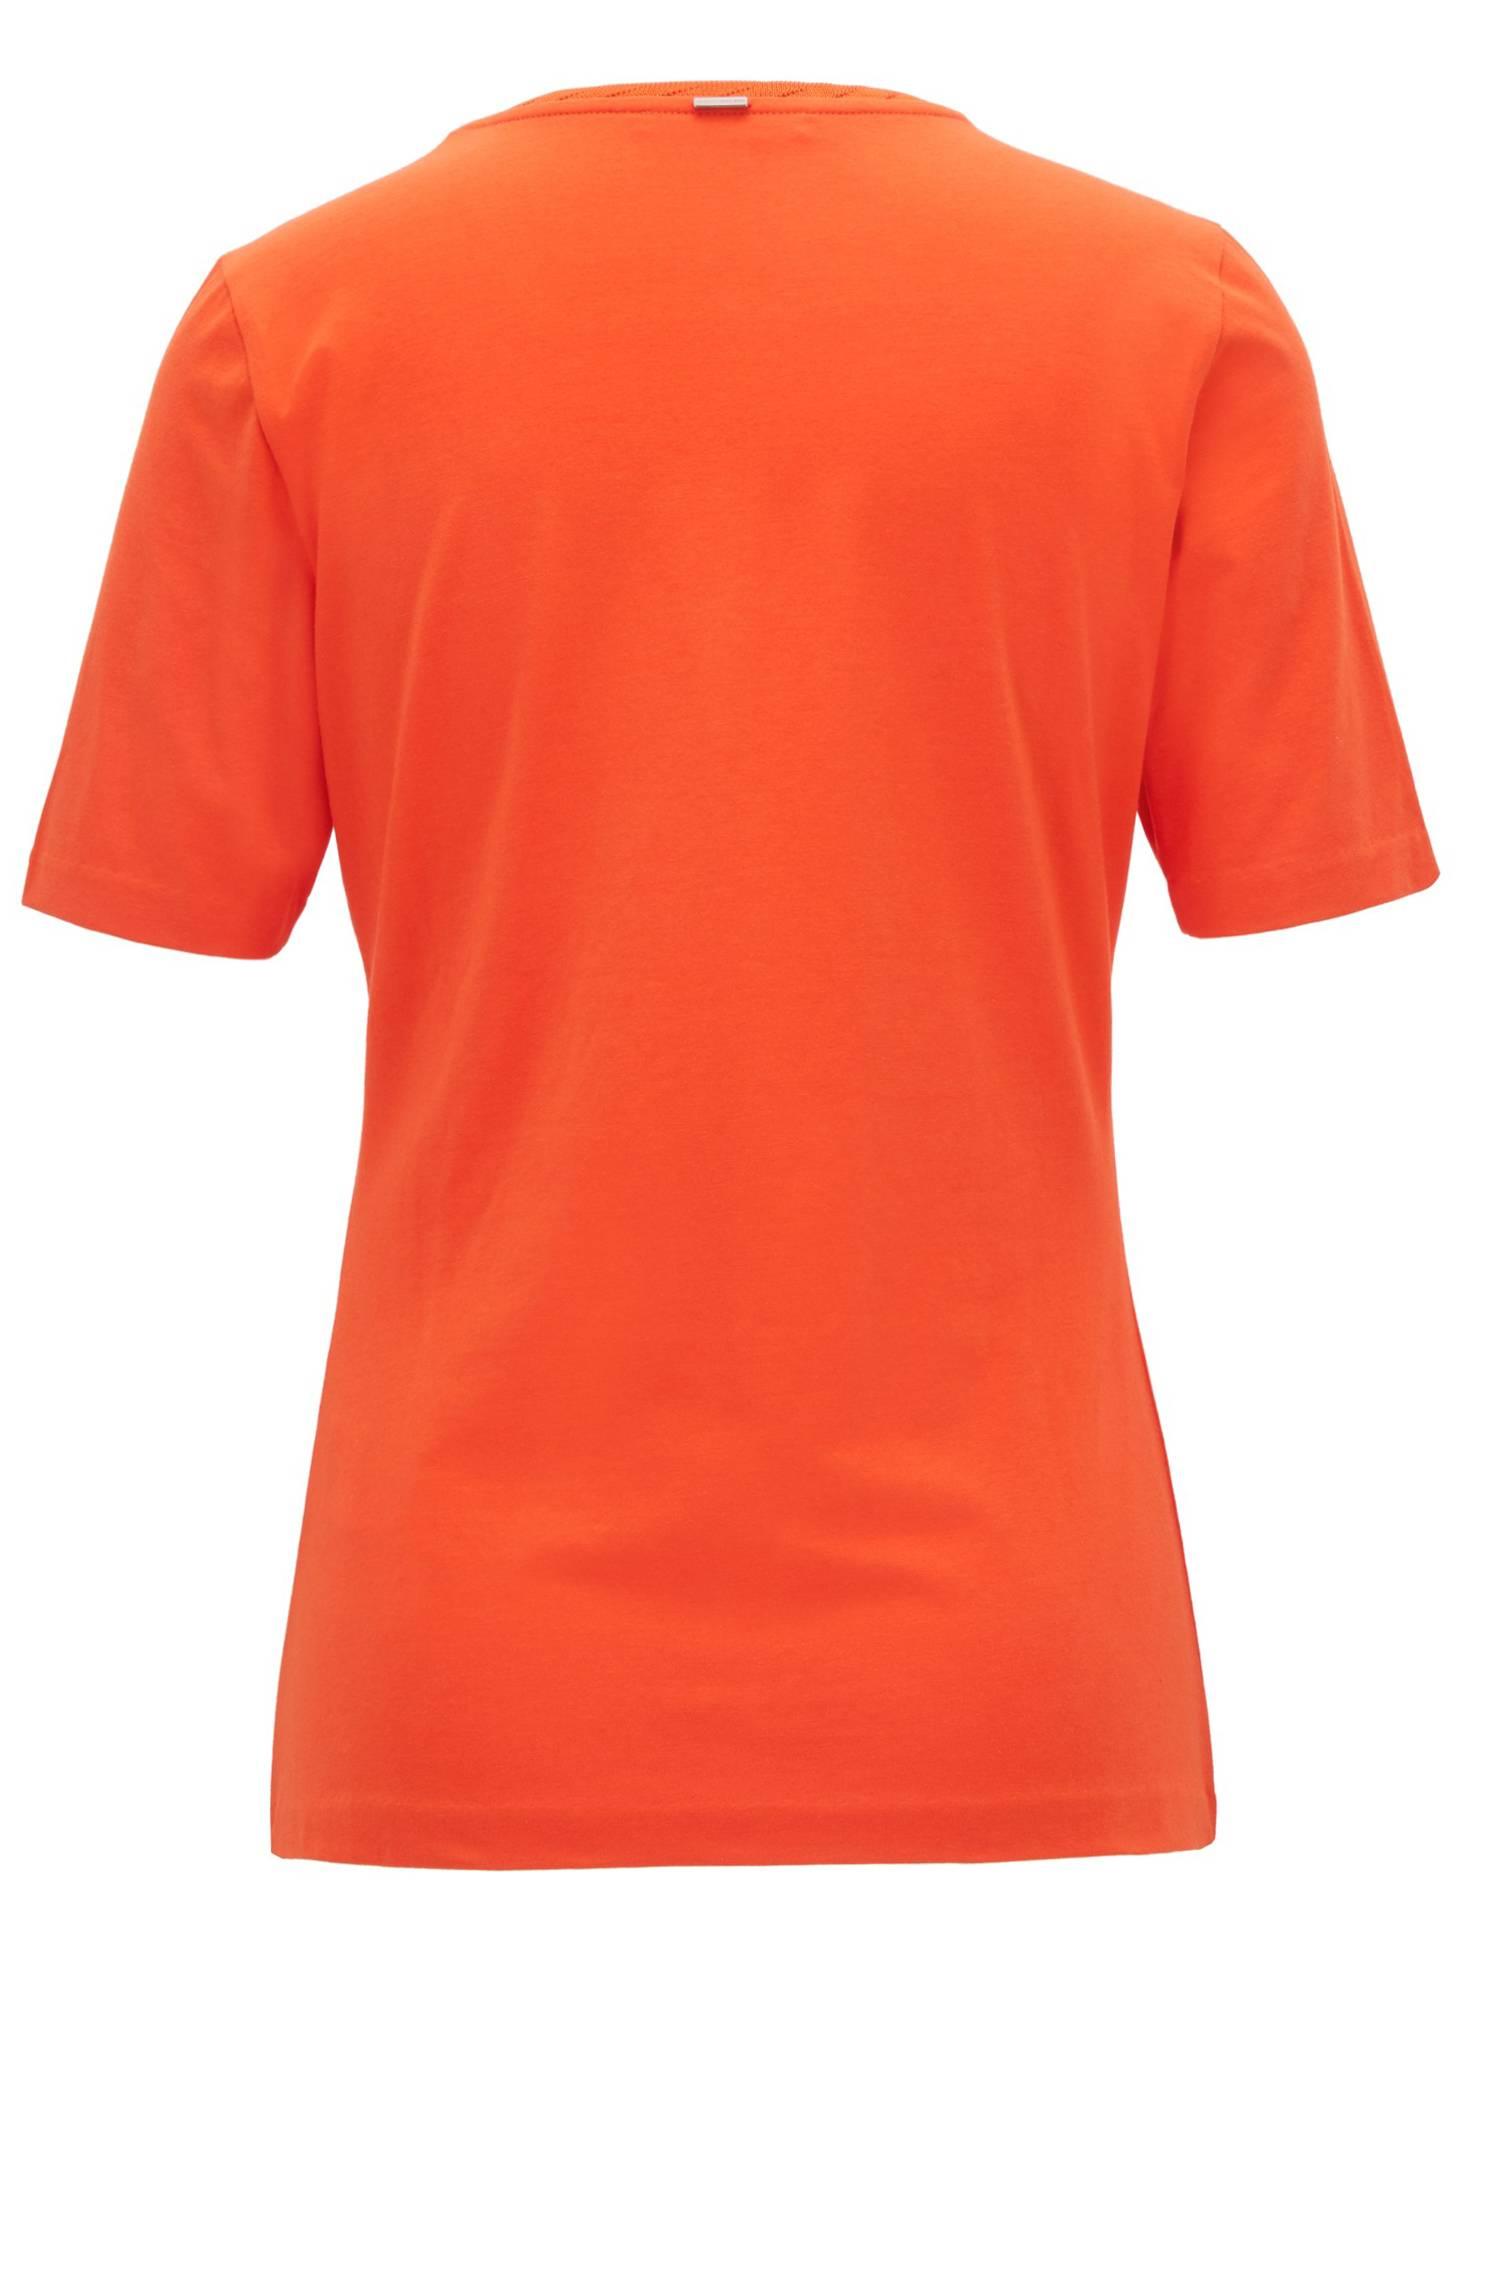 BOSS T-Shirt Emerly | Exquisite Exquisite Exquisite Verarbeitung  | Qualität zuerst  | Online Outlet Store  | Shopping Online  | Fuxin  80dca4